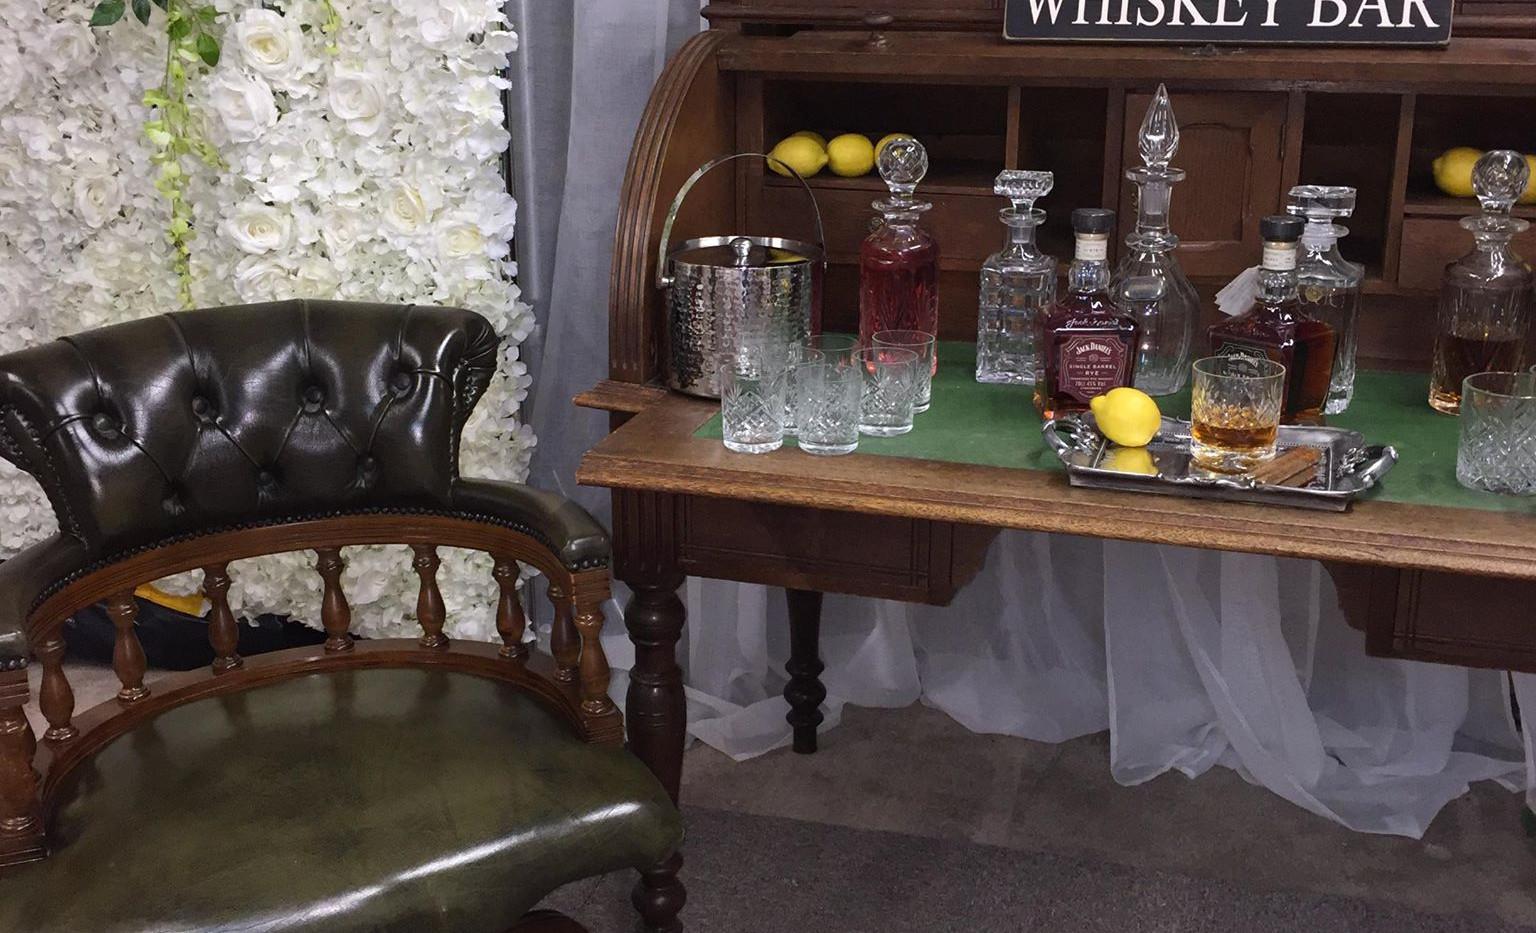 Whiskey Bar Desk | Chocolate Falls